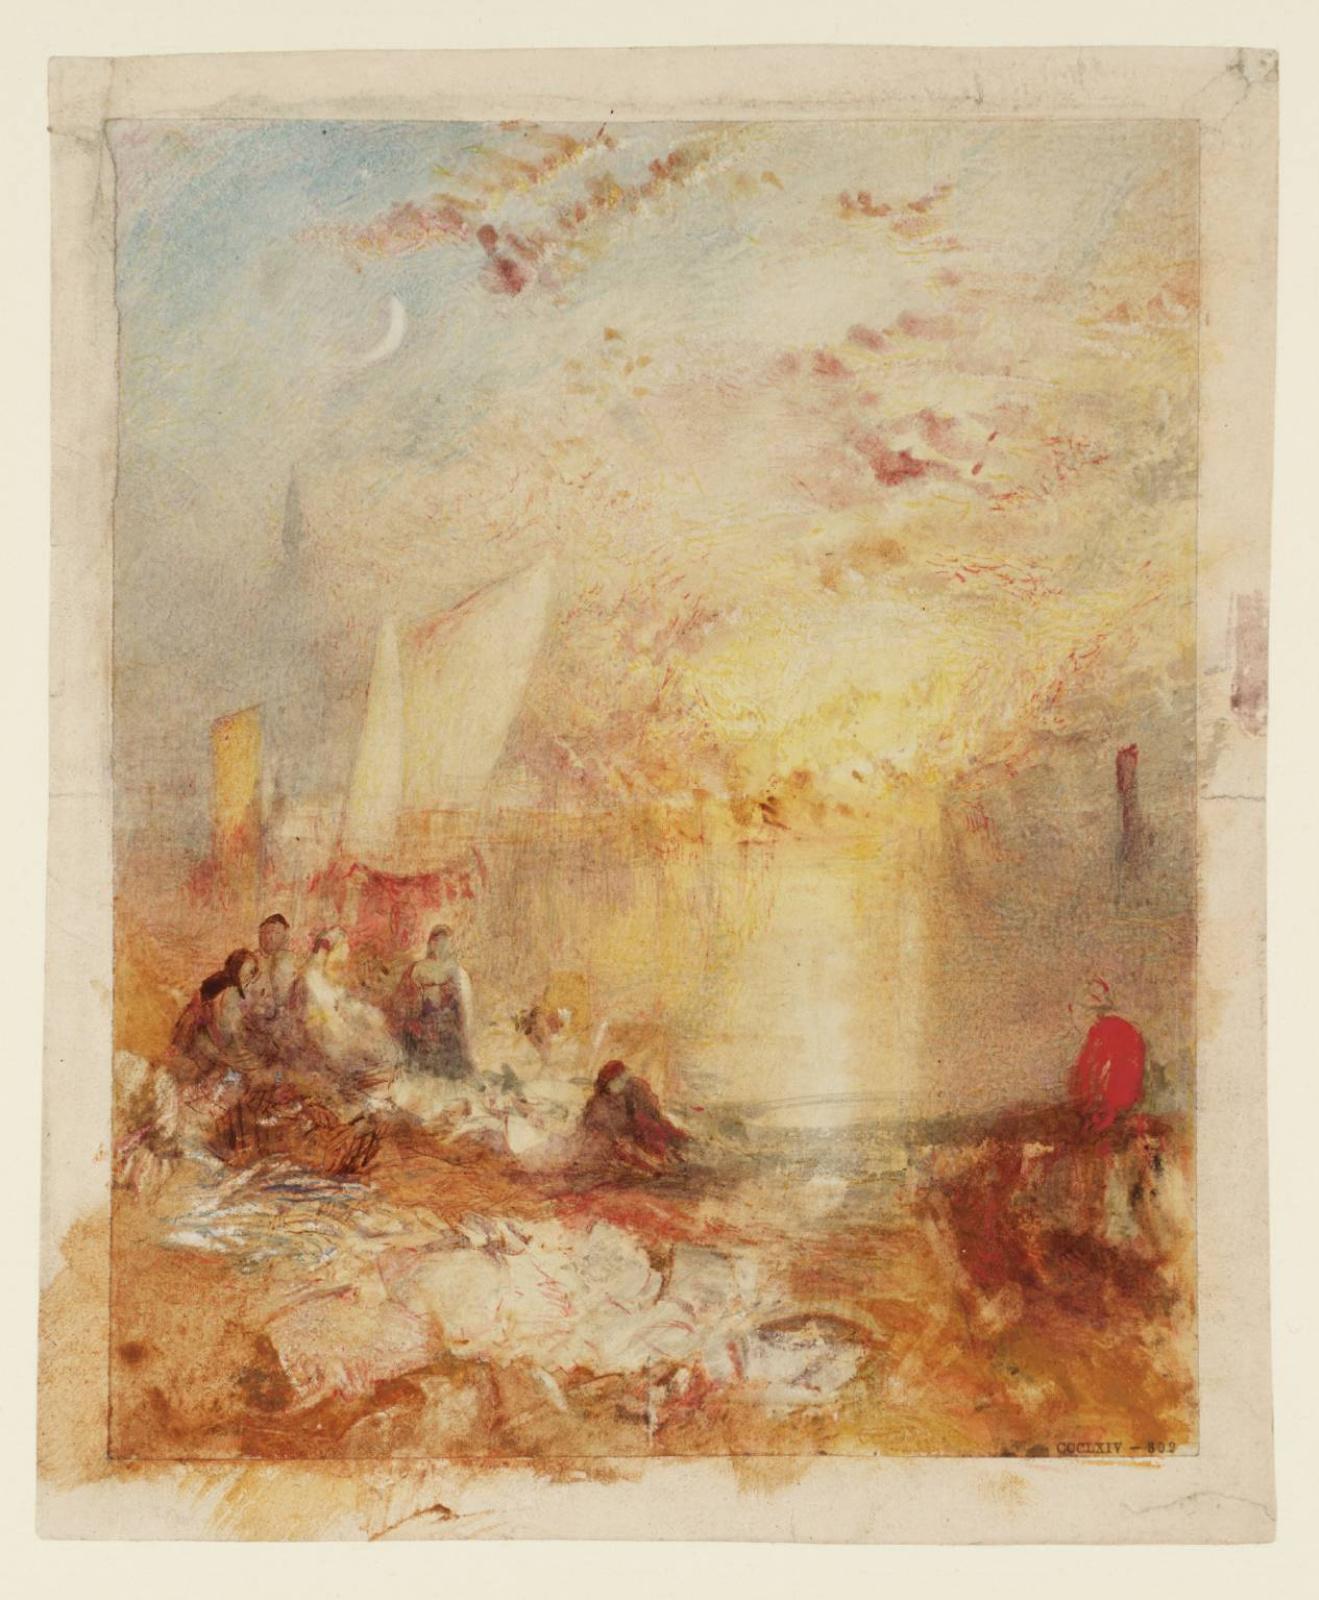 Джозеф Мэллорд Уильям Тёрнер. Закат. Рыбный рынок на пляже